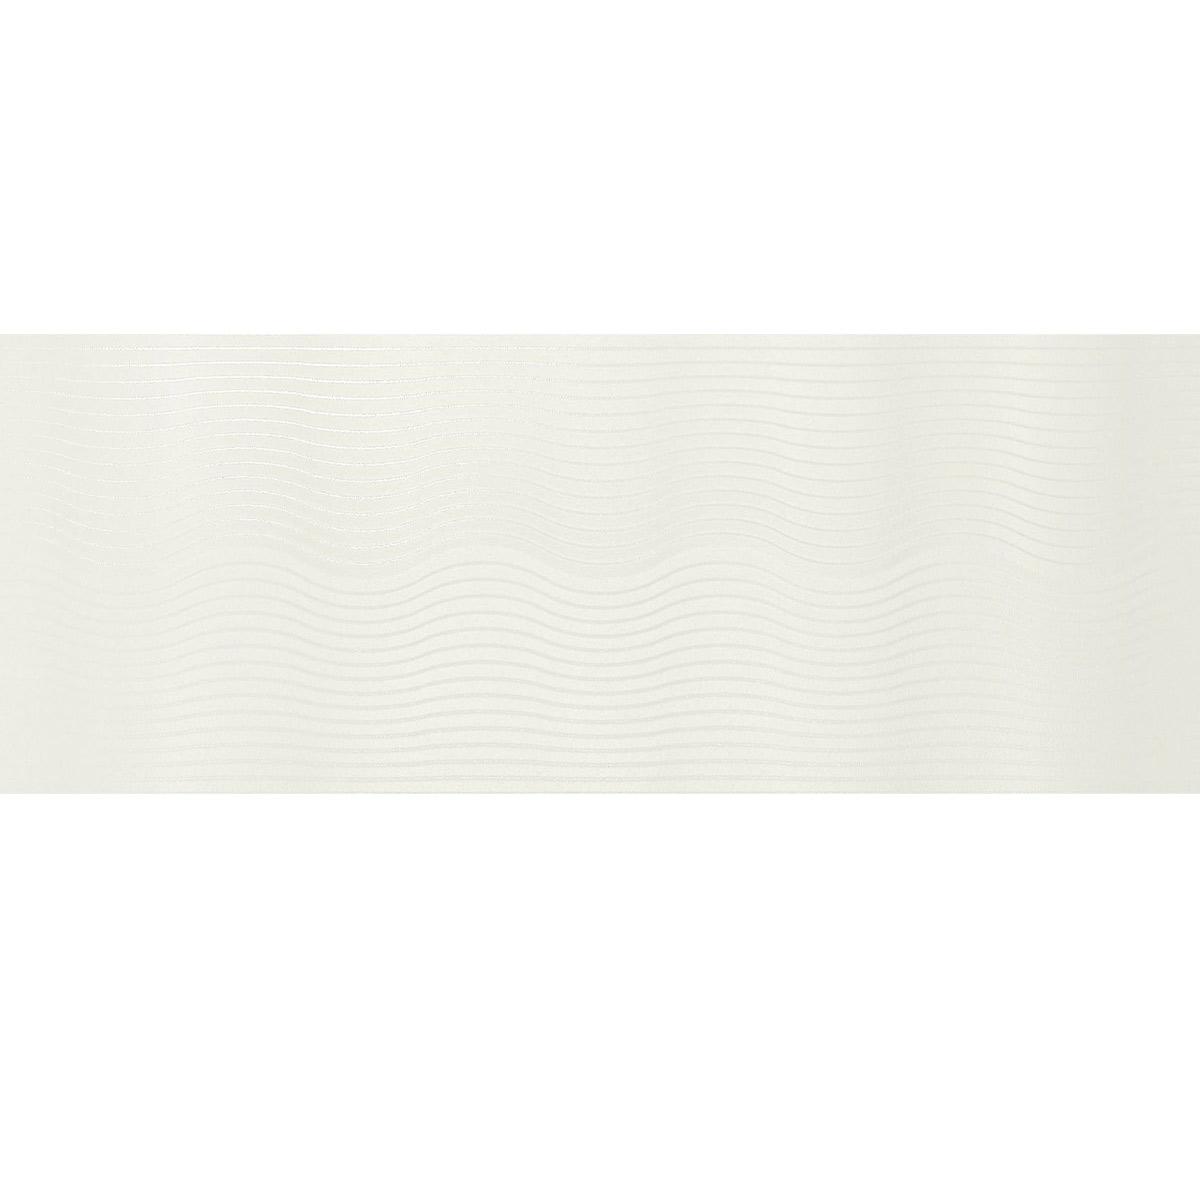 NACAR EVULOTION WHITE P1 EDIT 1 1